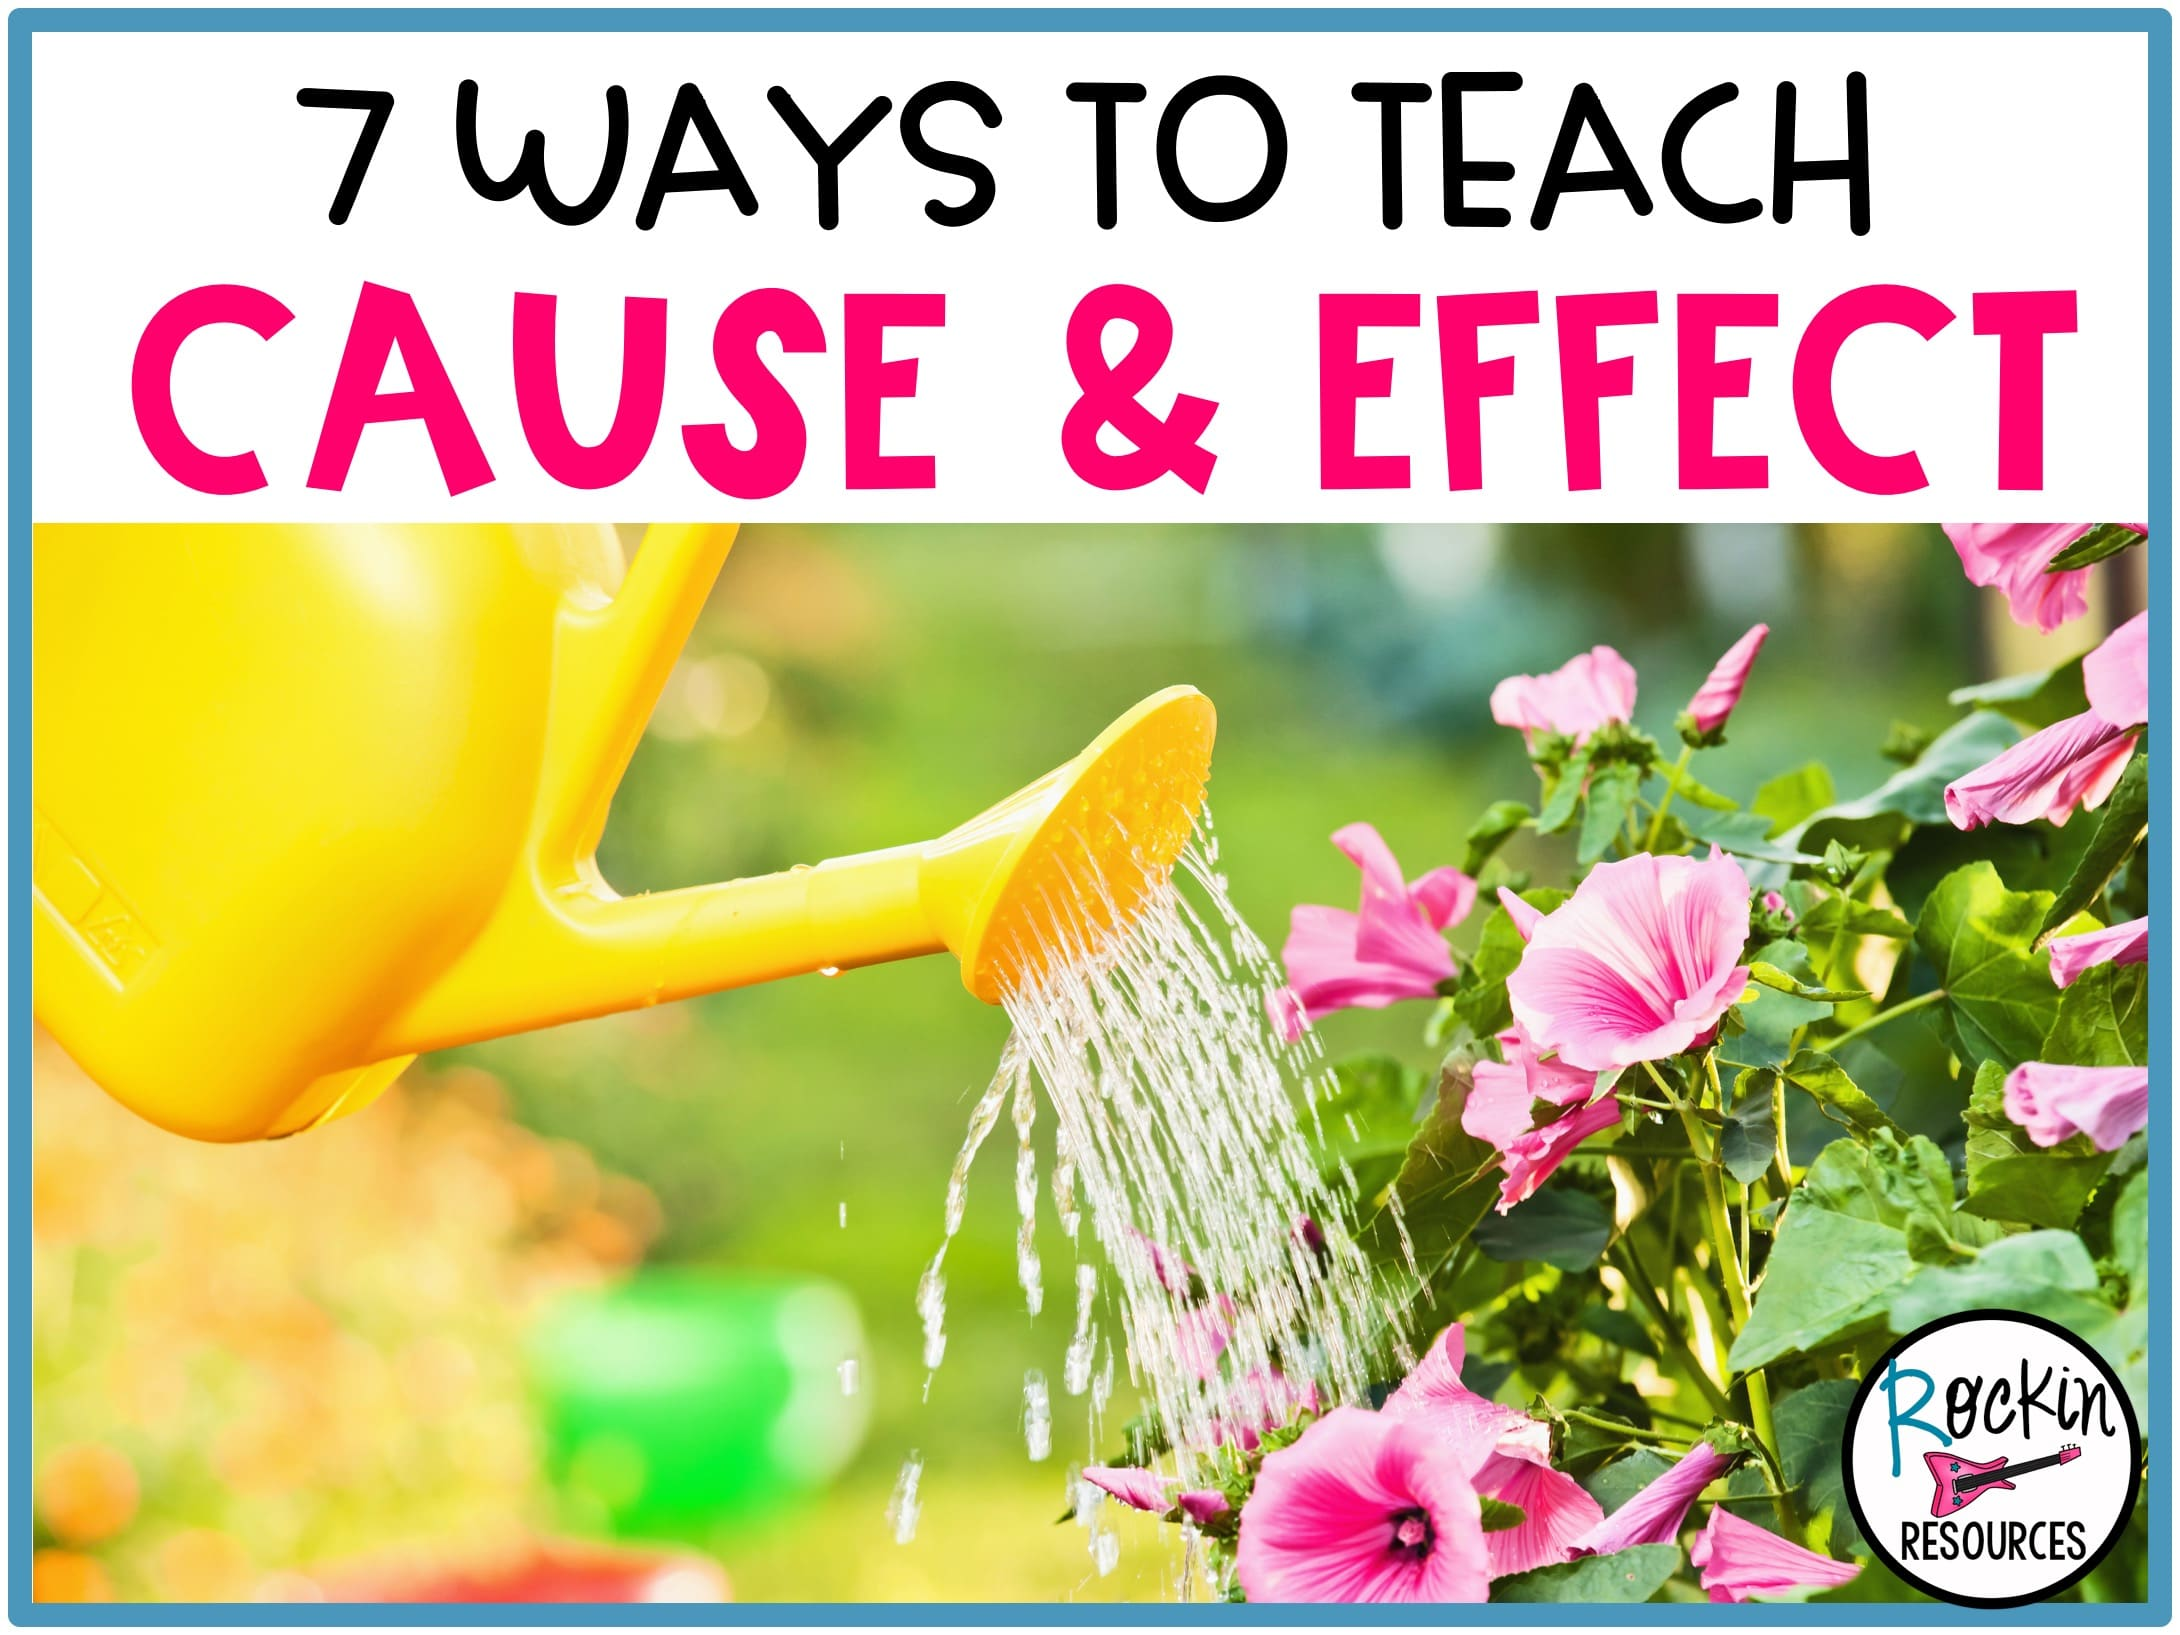 medium resolution of 7 Ways to Teach Cause and Effect   Rockin Resources